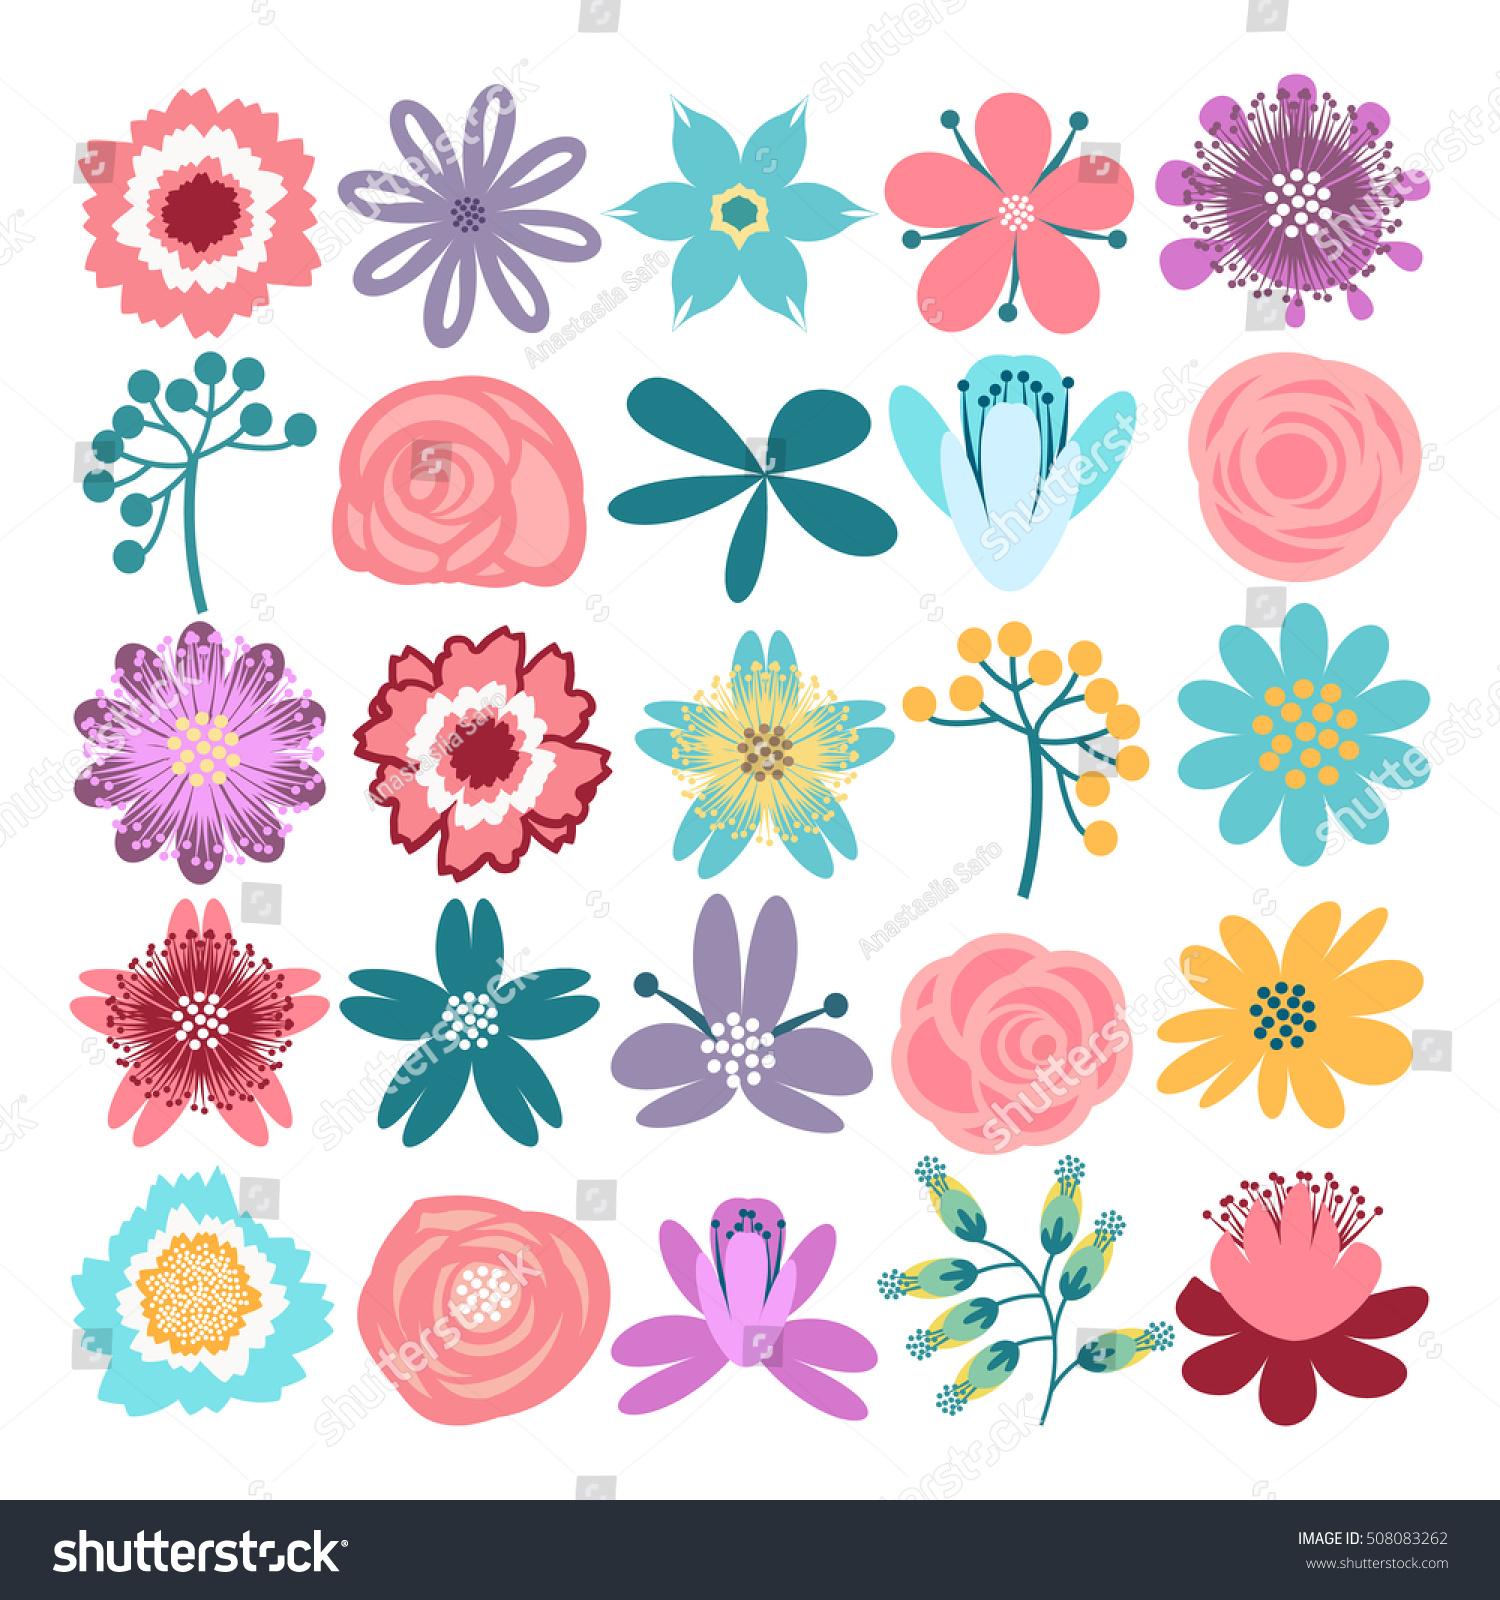 Vector set flowers good birthday cards stock vector 508083262 vector set of flowers good for birthday cards wedding invitations and scrapbook izmirmasajfo